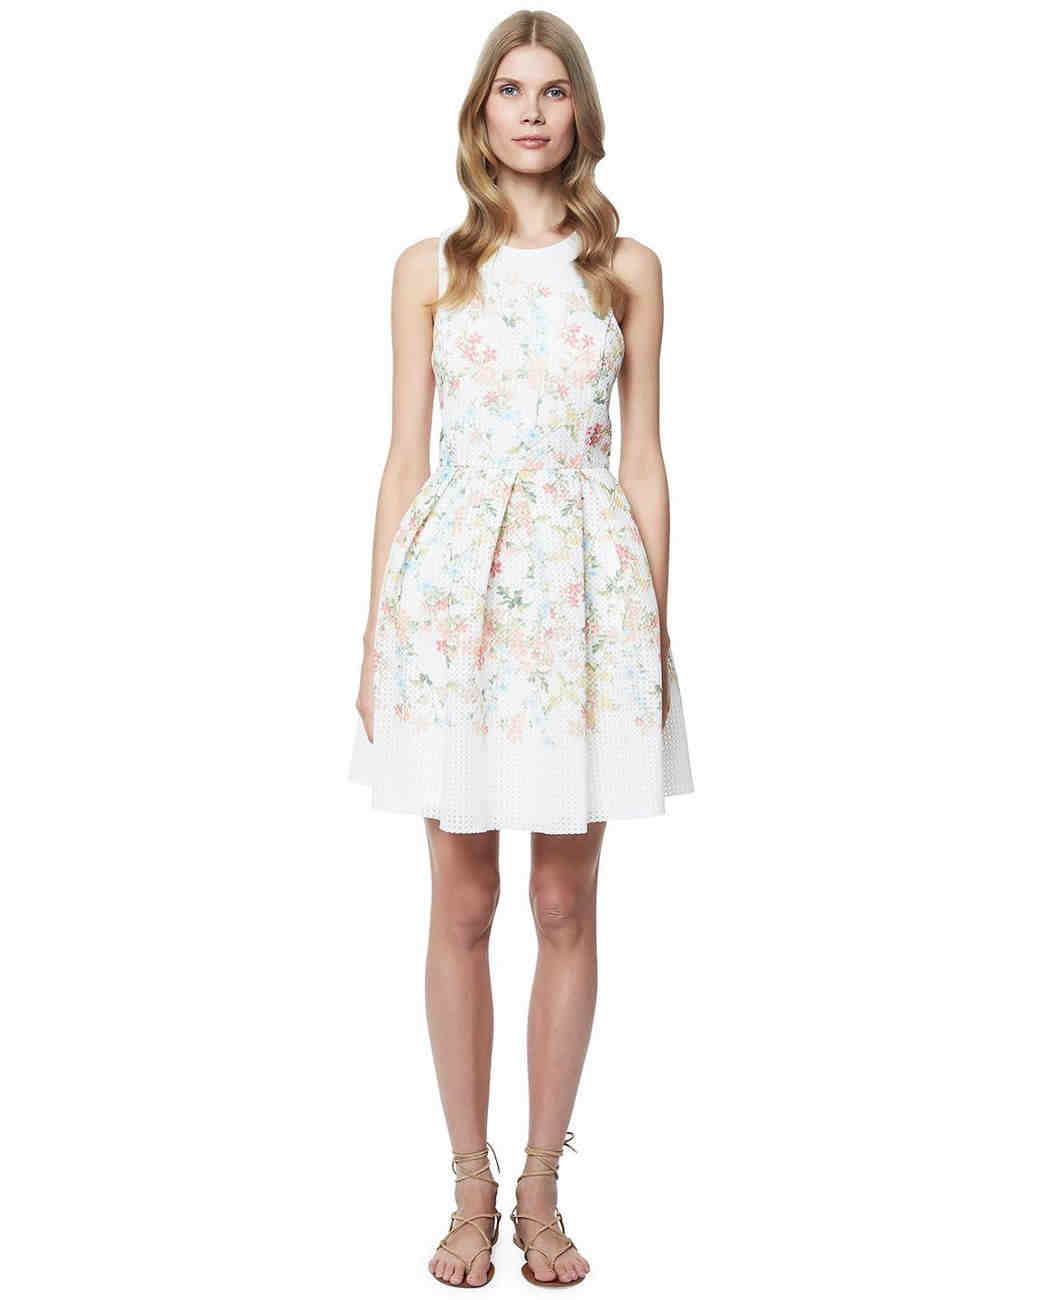 bachelorette-party-dress-erin-fetherston-somerset-dress-0416.jpg